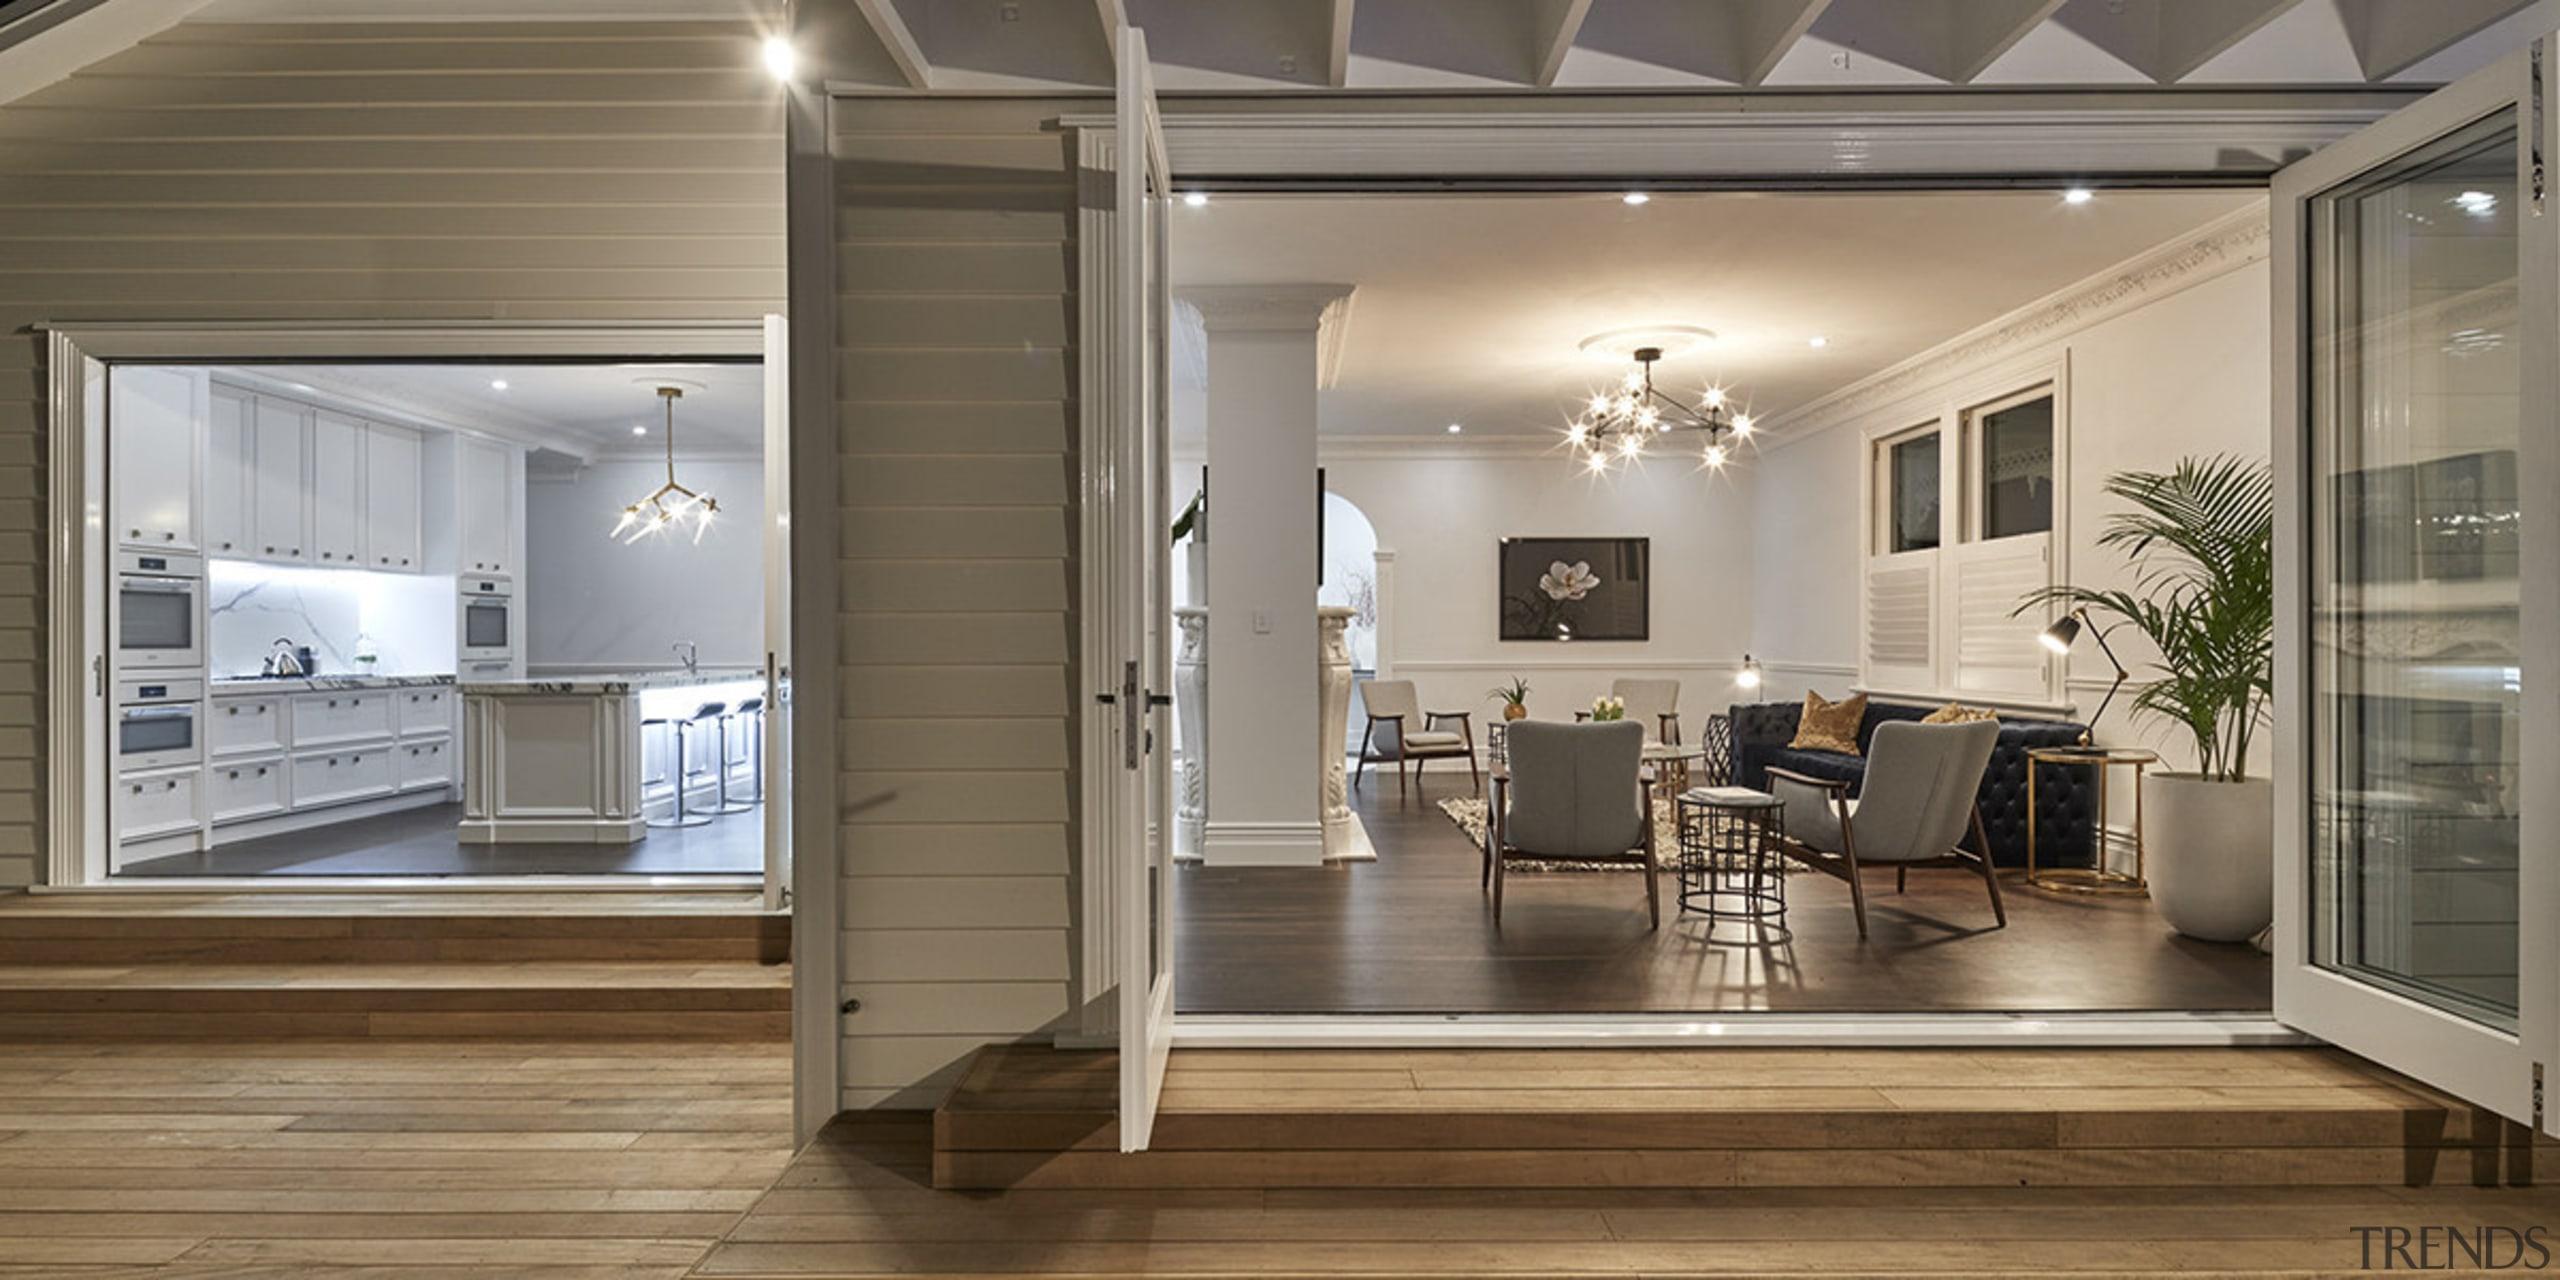 This villa renovation has reworked the organisation of ceiling, floor, flooring, interior design, laminate flooring, living room, window, wood flooring, gray, brown